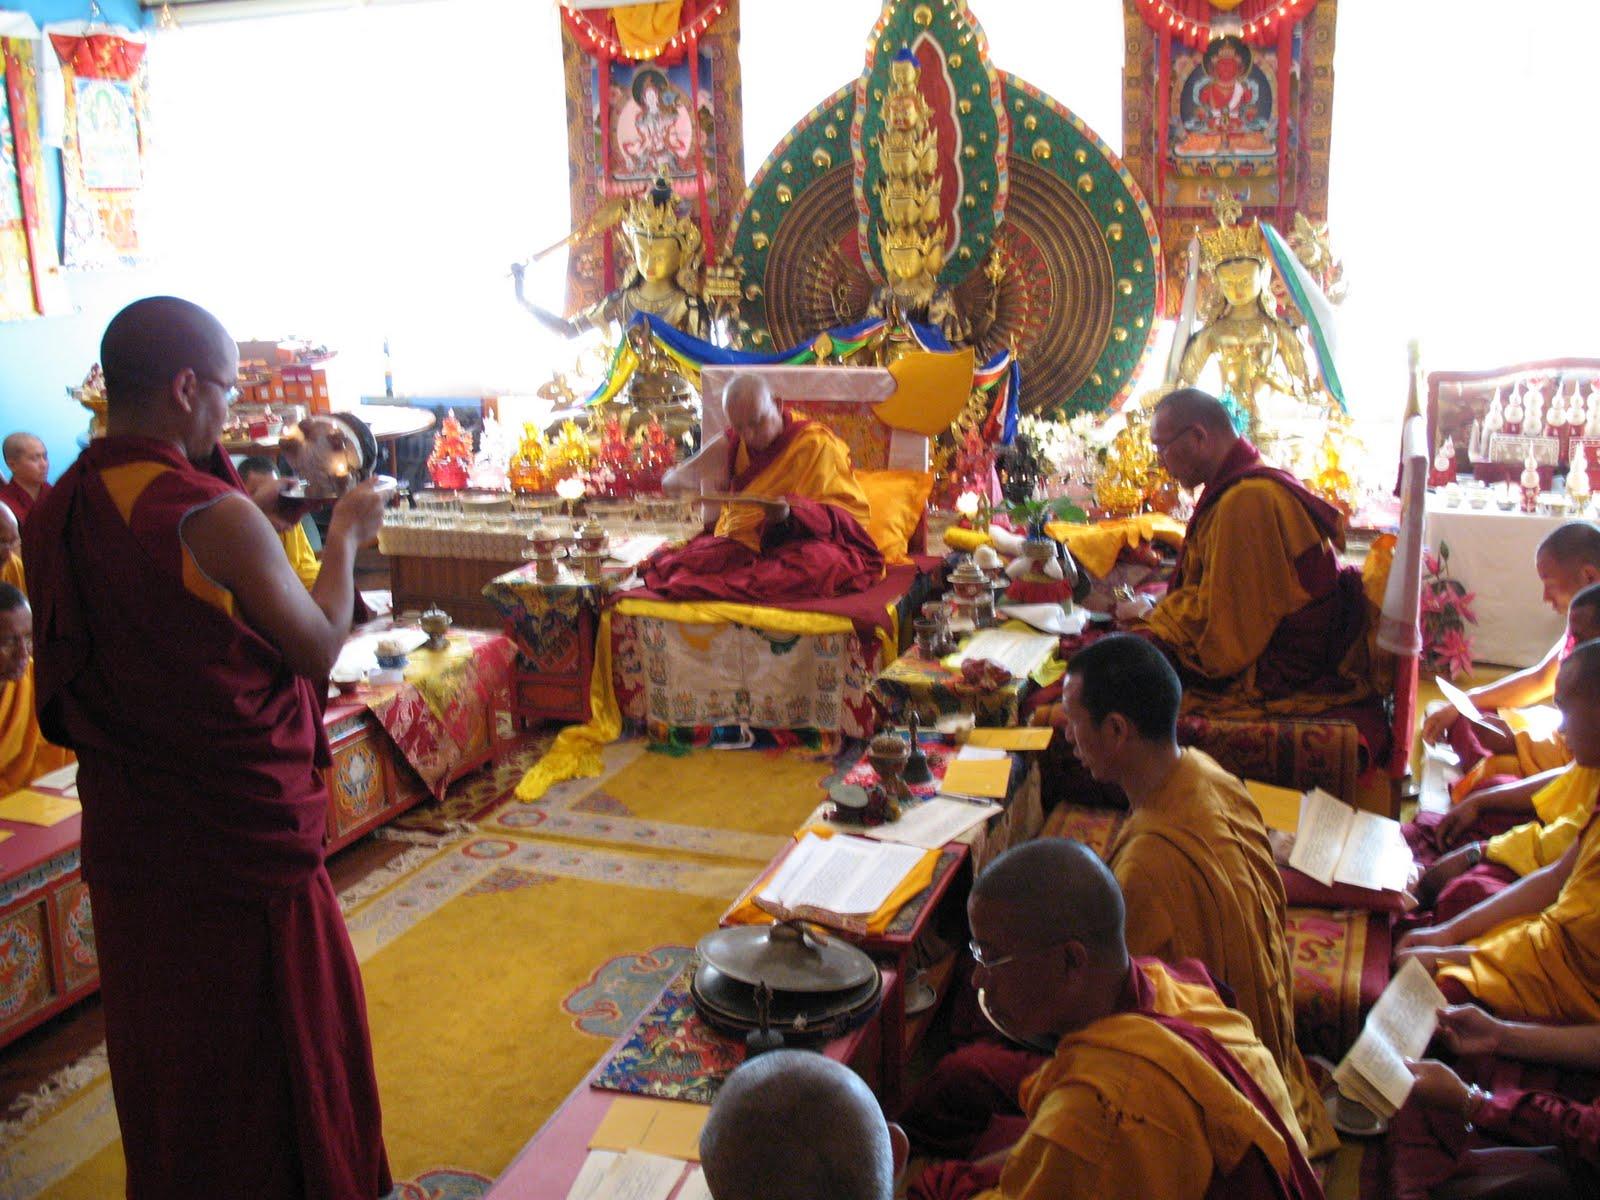 SpeciallonglifepujatoLamaZopaRinpoche,KopanMonastery, June2007.